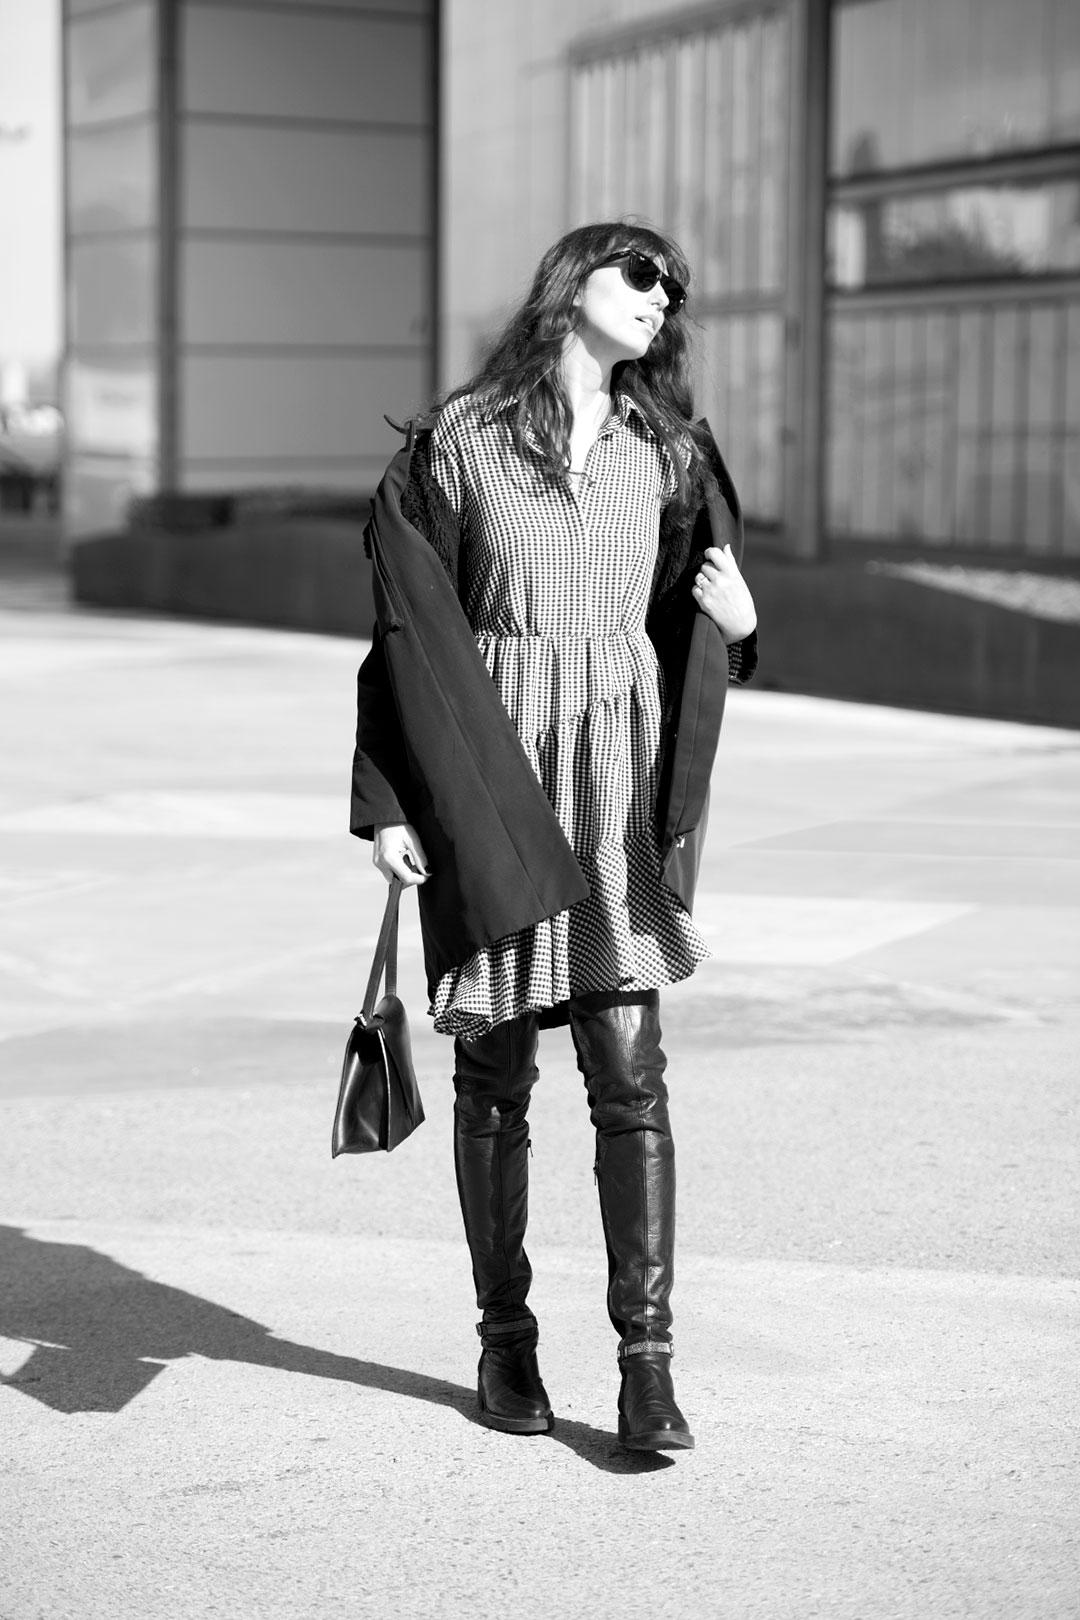 mbfwm-black-and-white-street-style-mitmeblog-bn-web-04